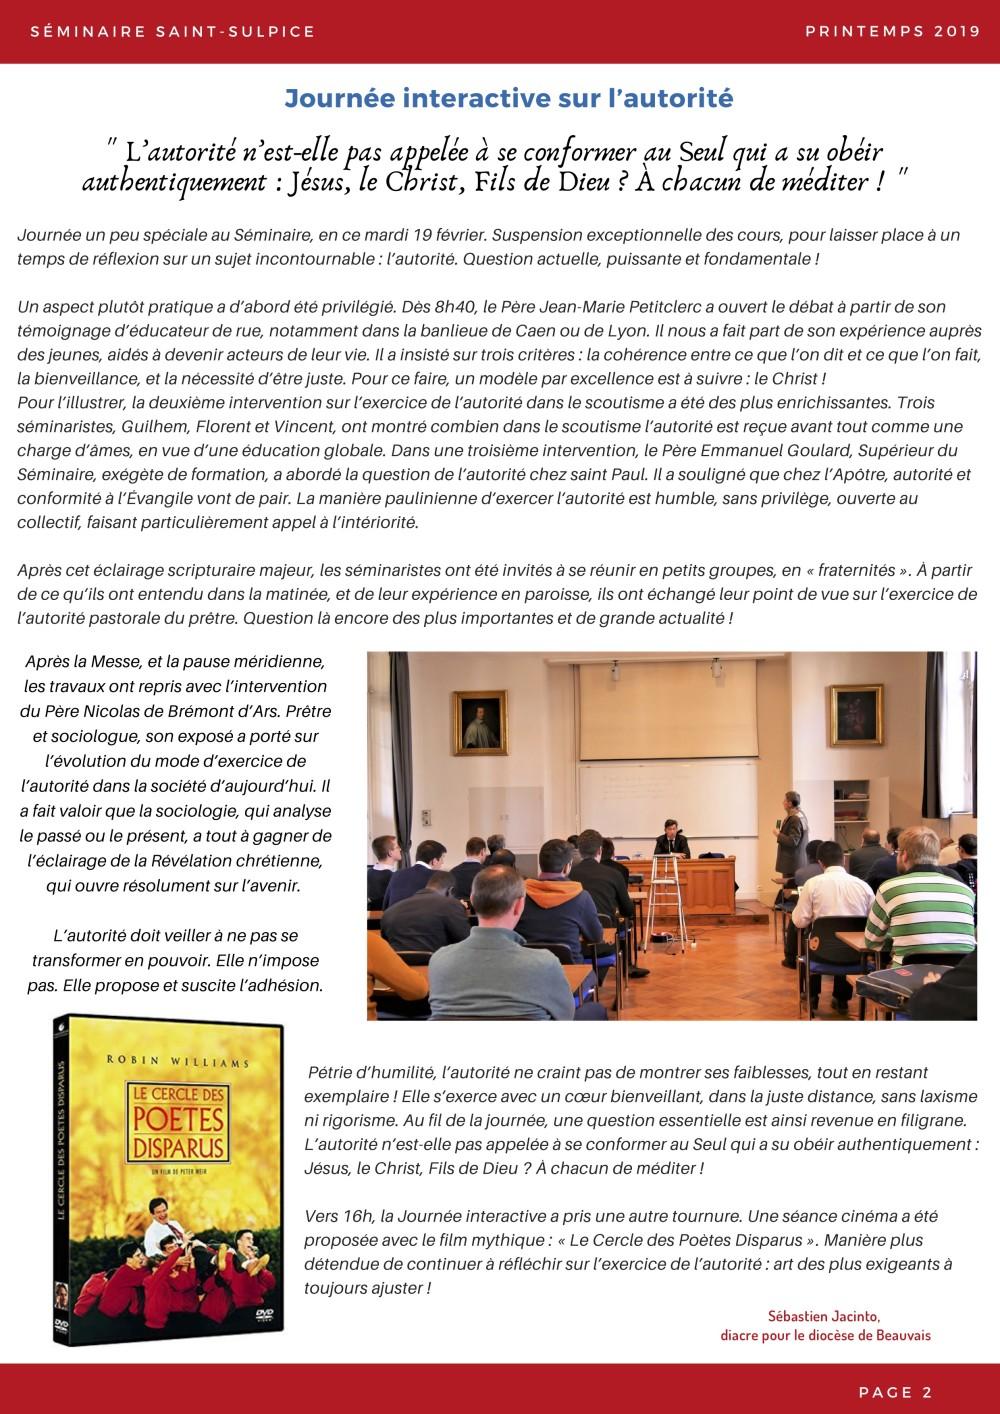 Newsletter Séminaire Saint-Sulpice mai 2019 - p2